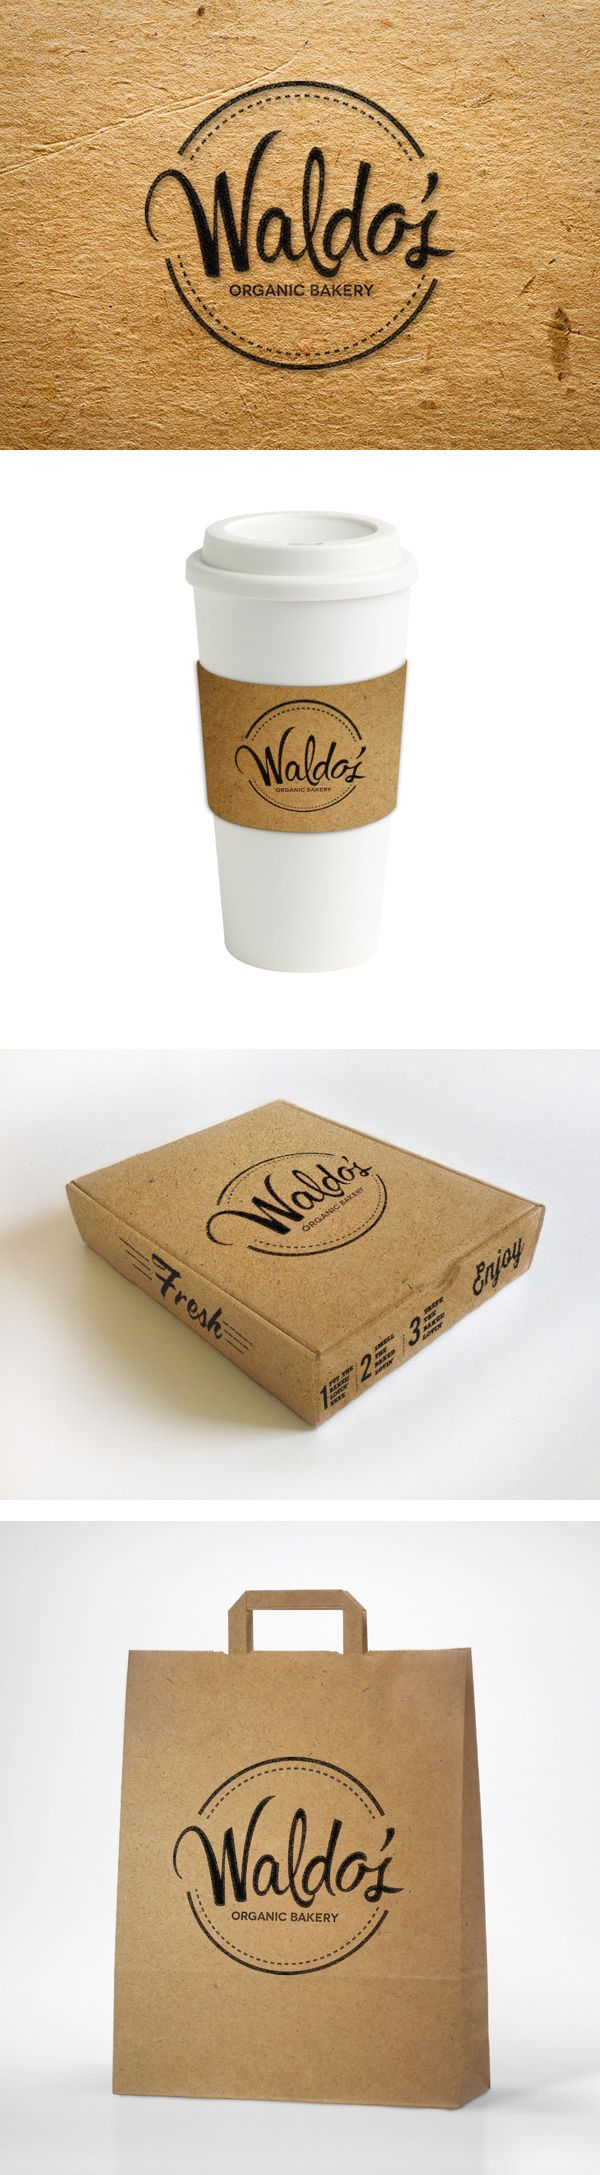 Best 25 Bakery logo design ideas on Pinterest Bakery